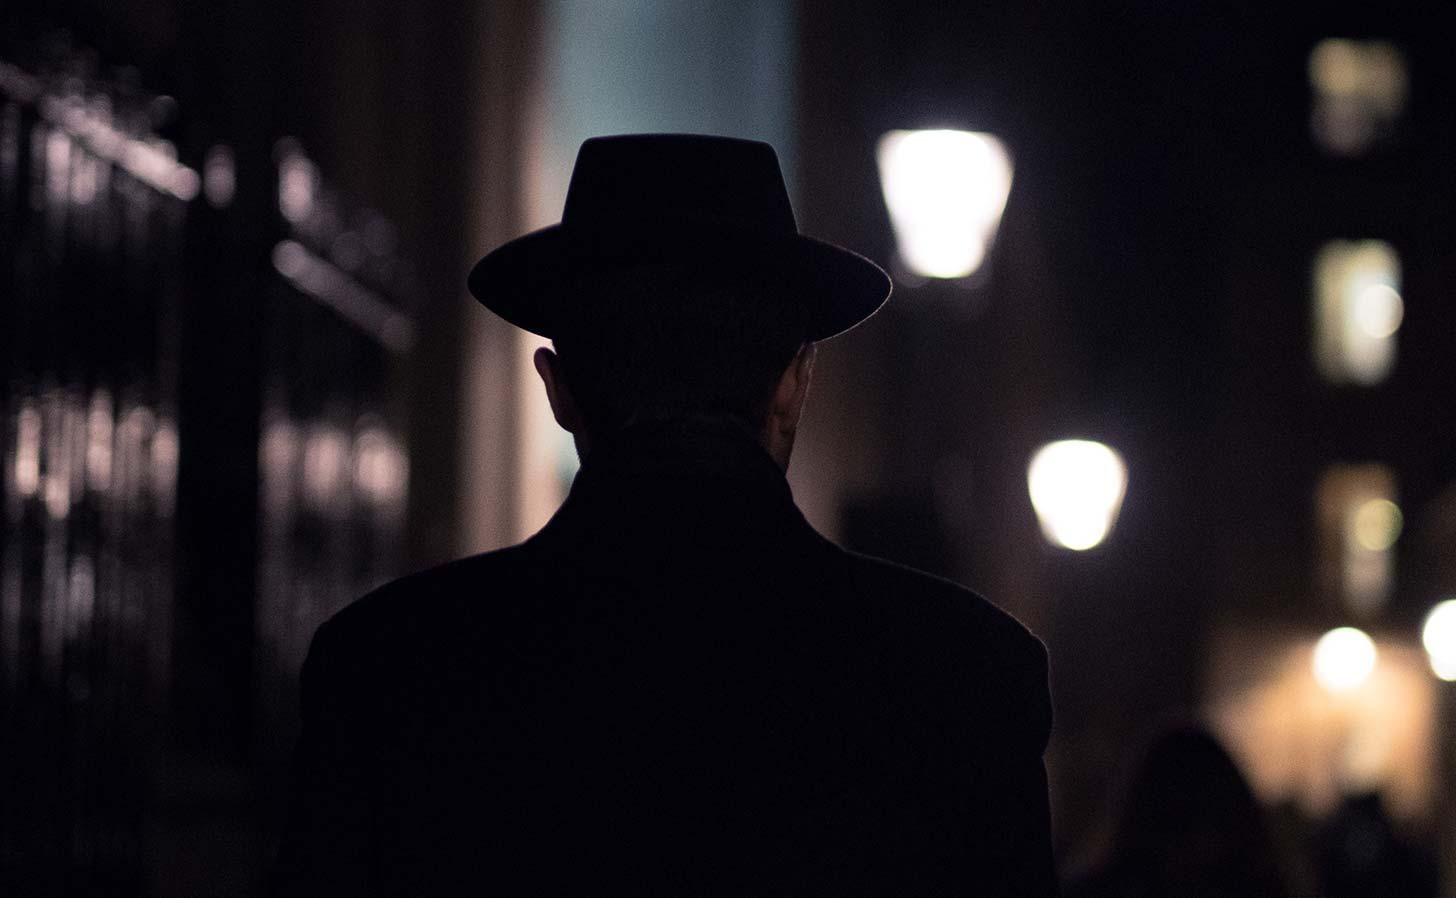 Spion på uppdrag? Foto: Craig Whitehead / Unsplash